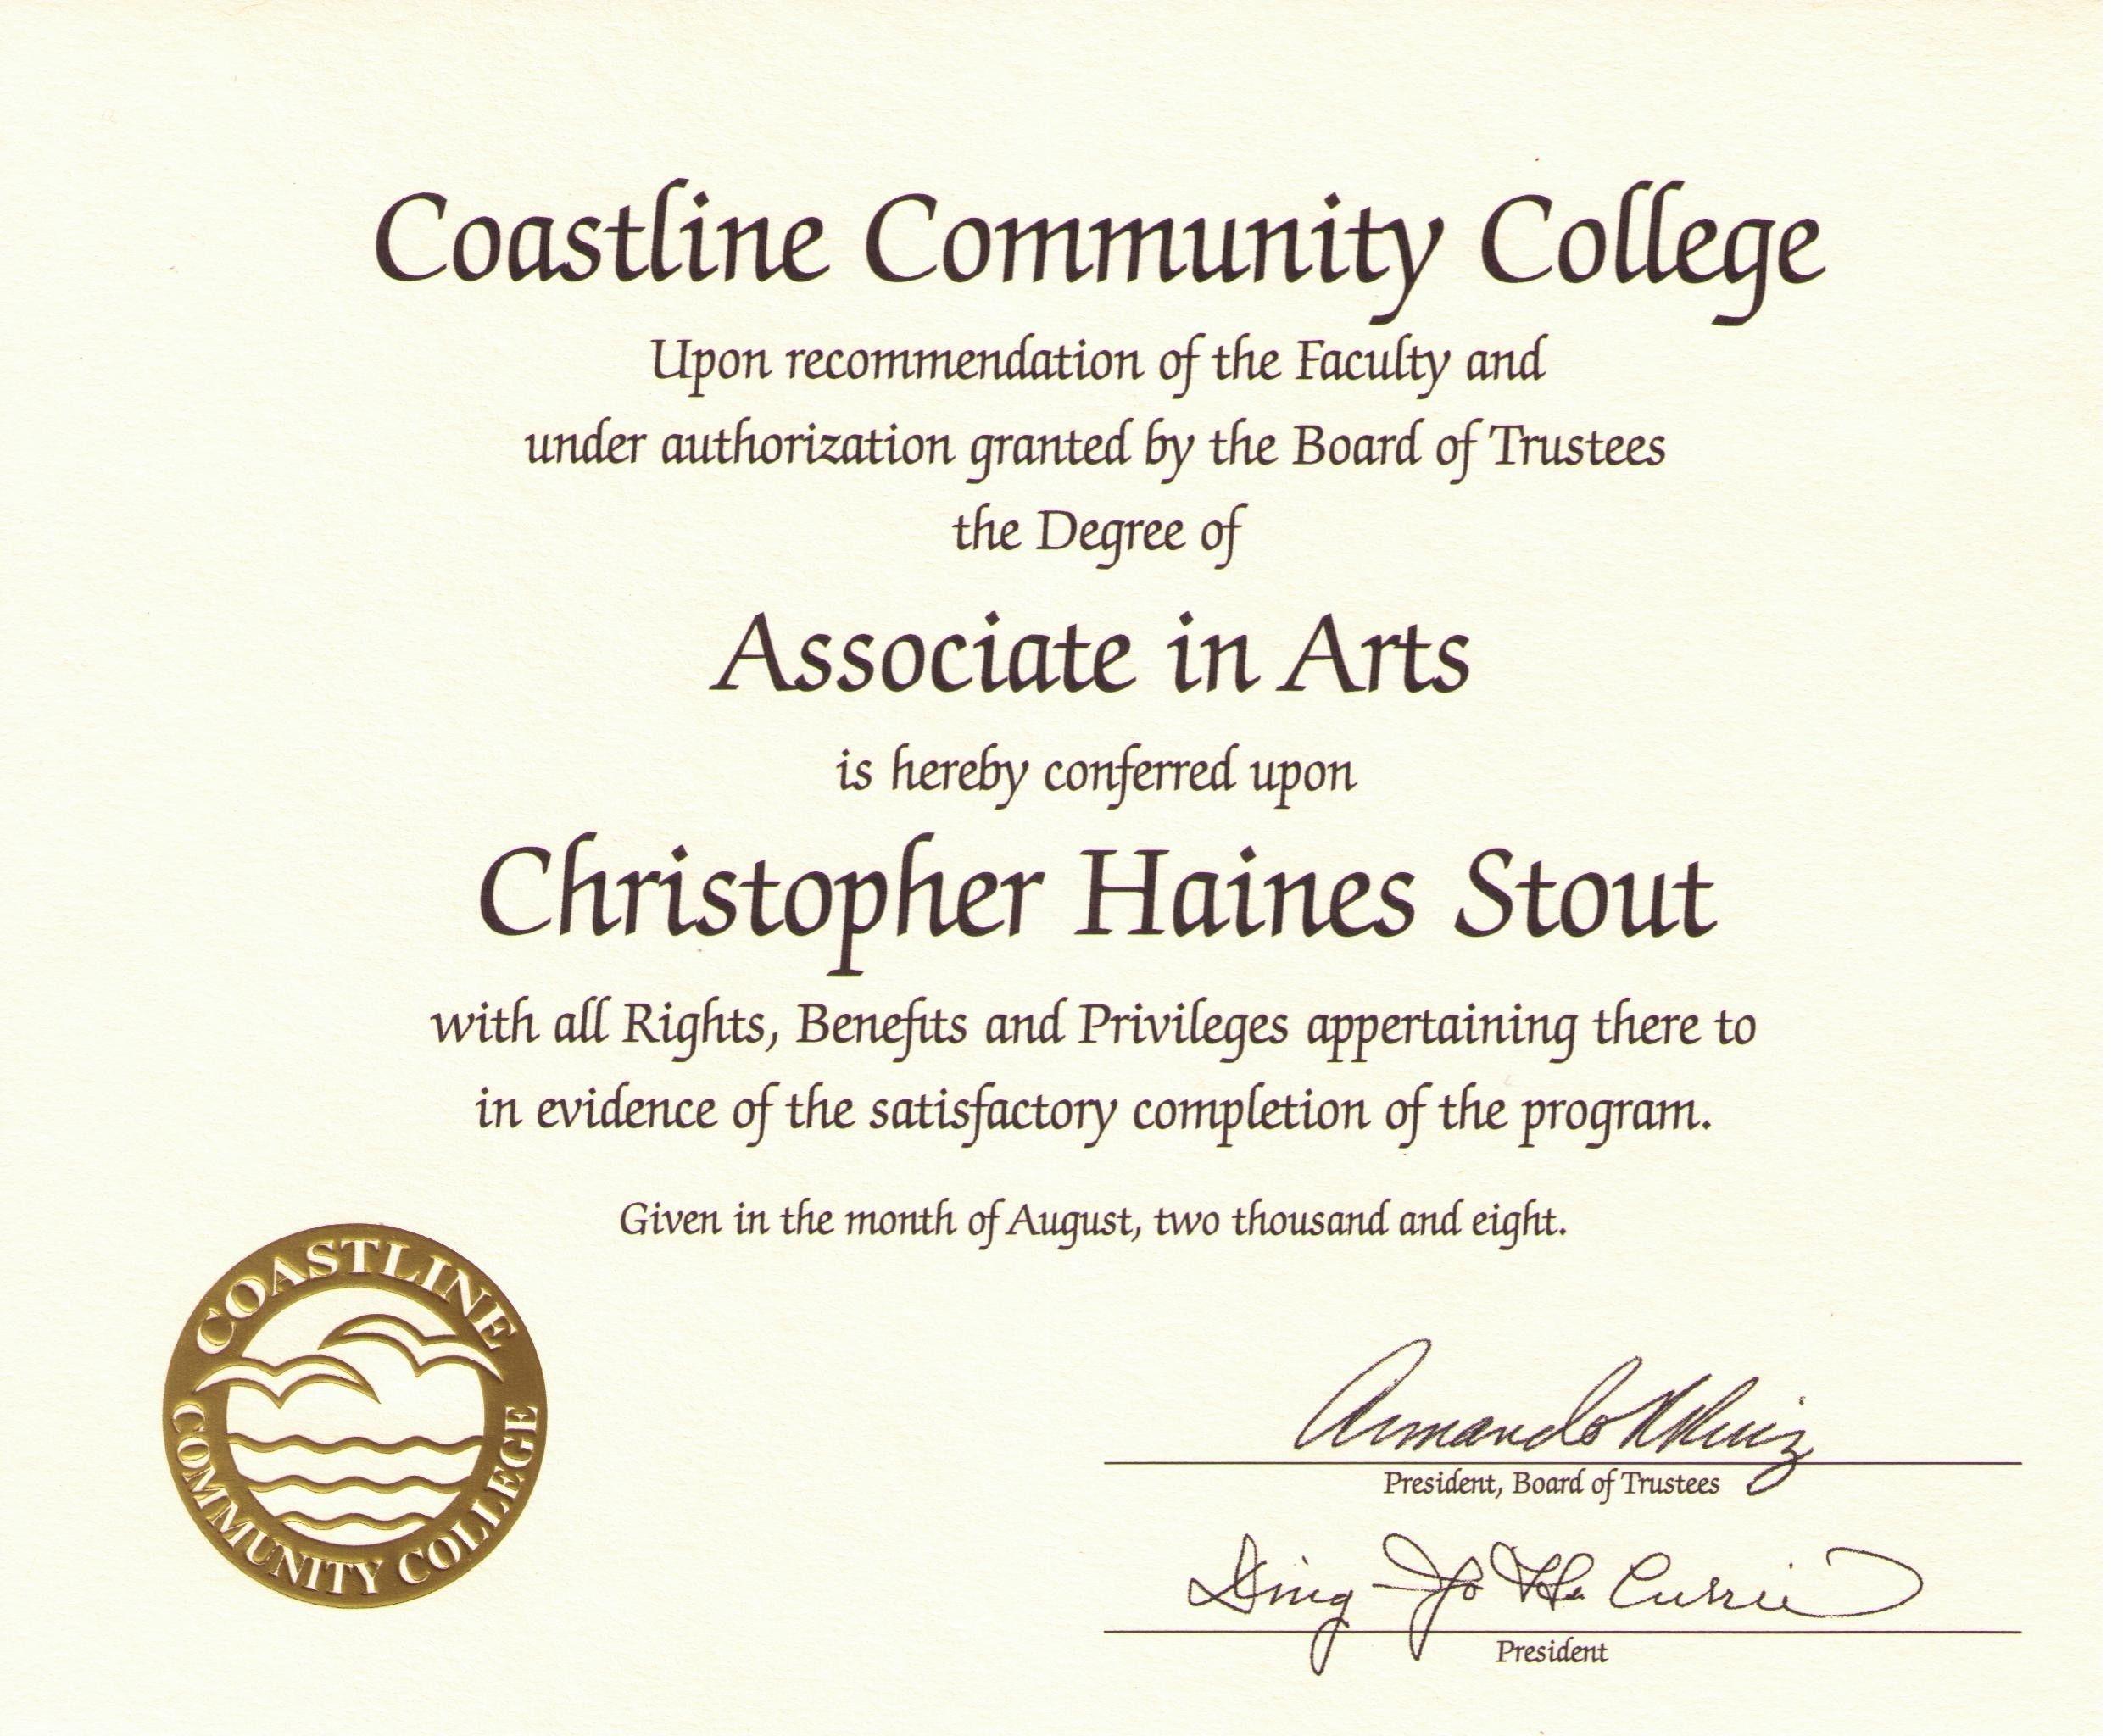 Free Printable College Diploma | Free Diploma Templates | In1 - Free Printable Diploma Template